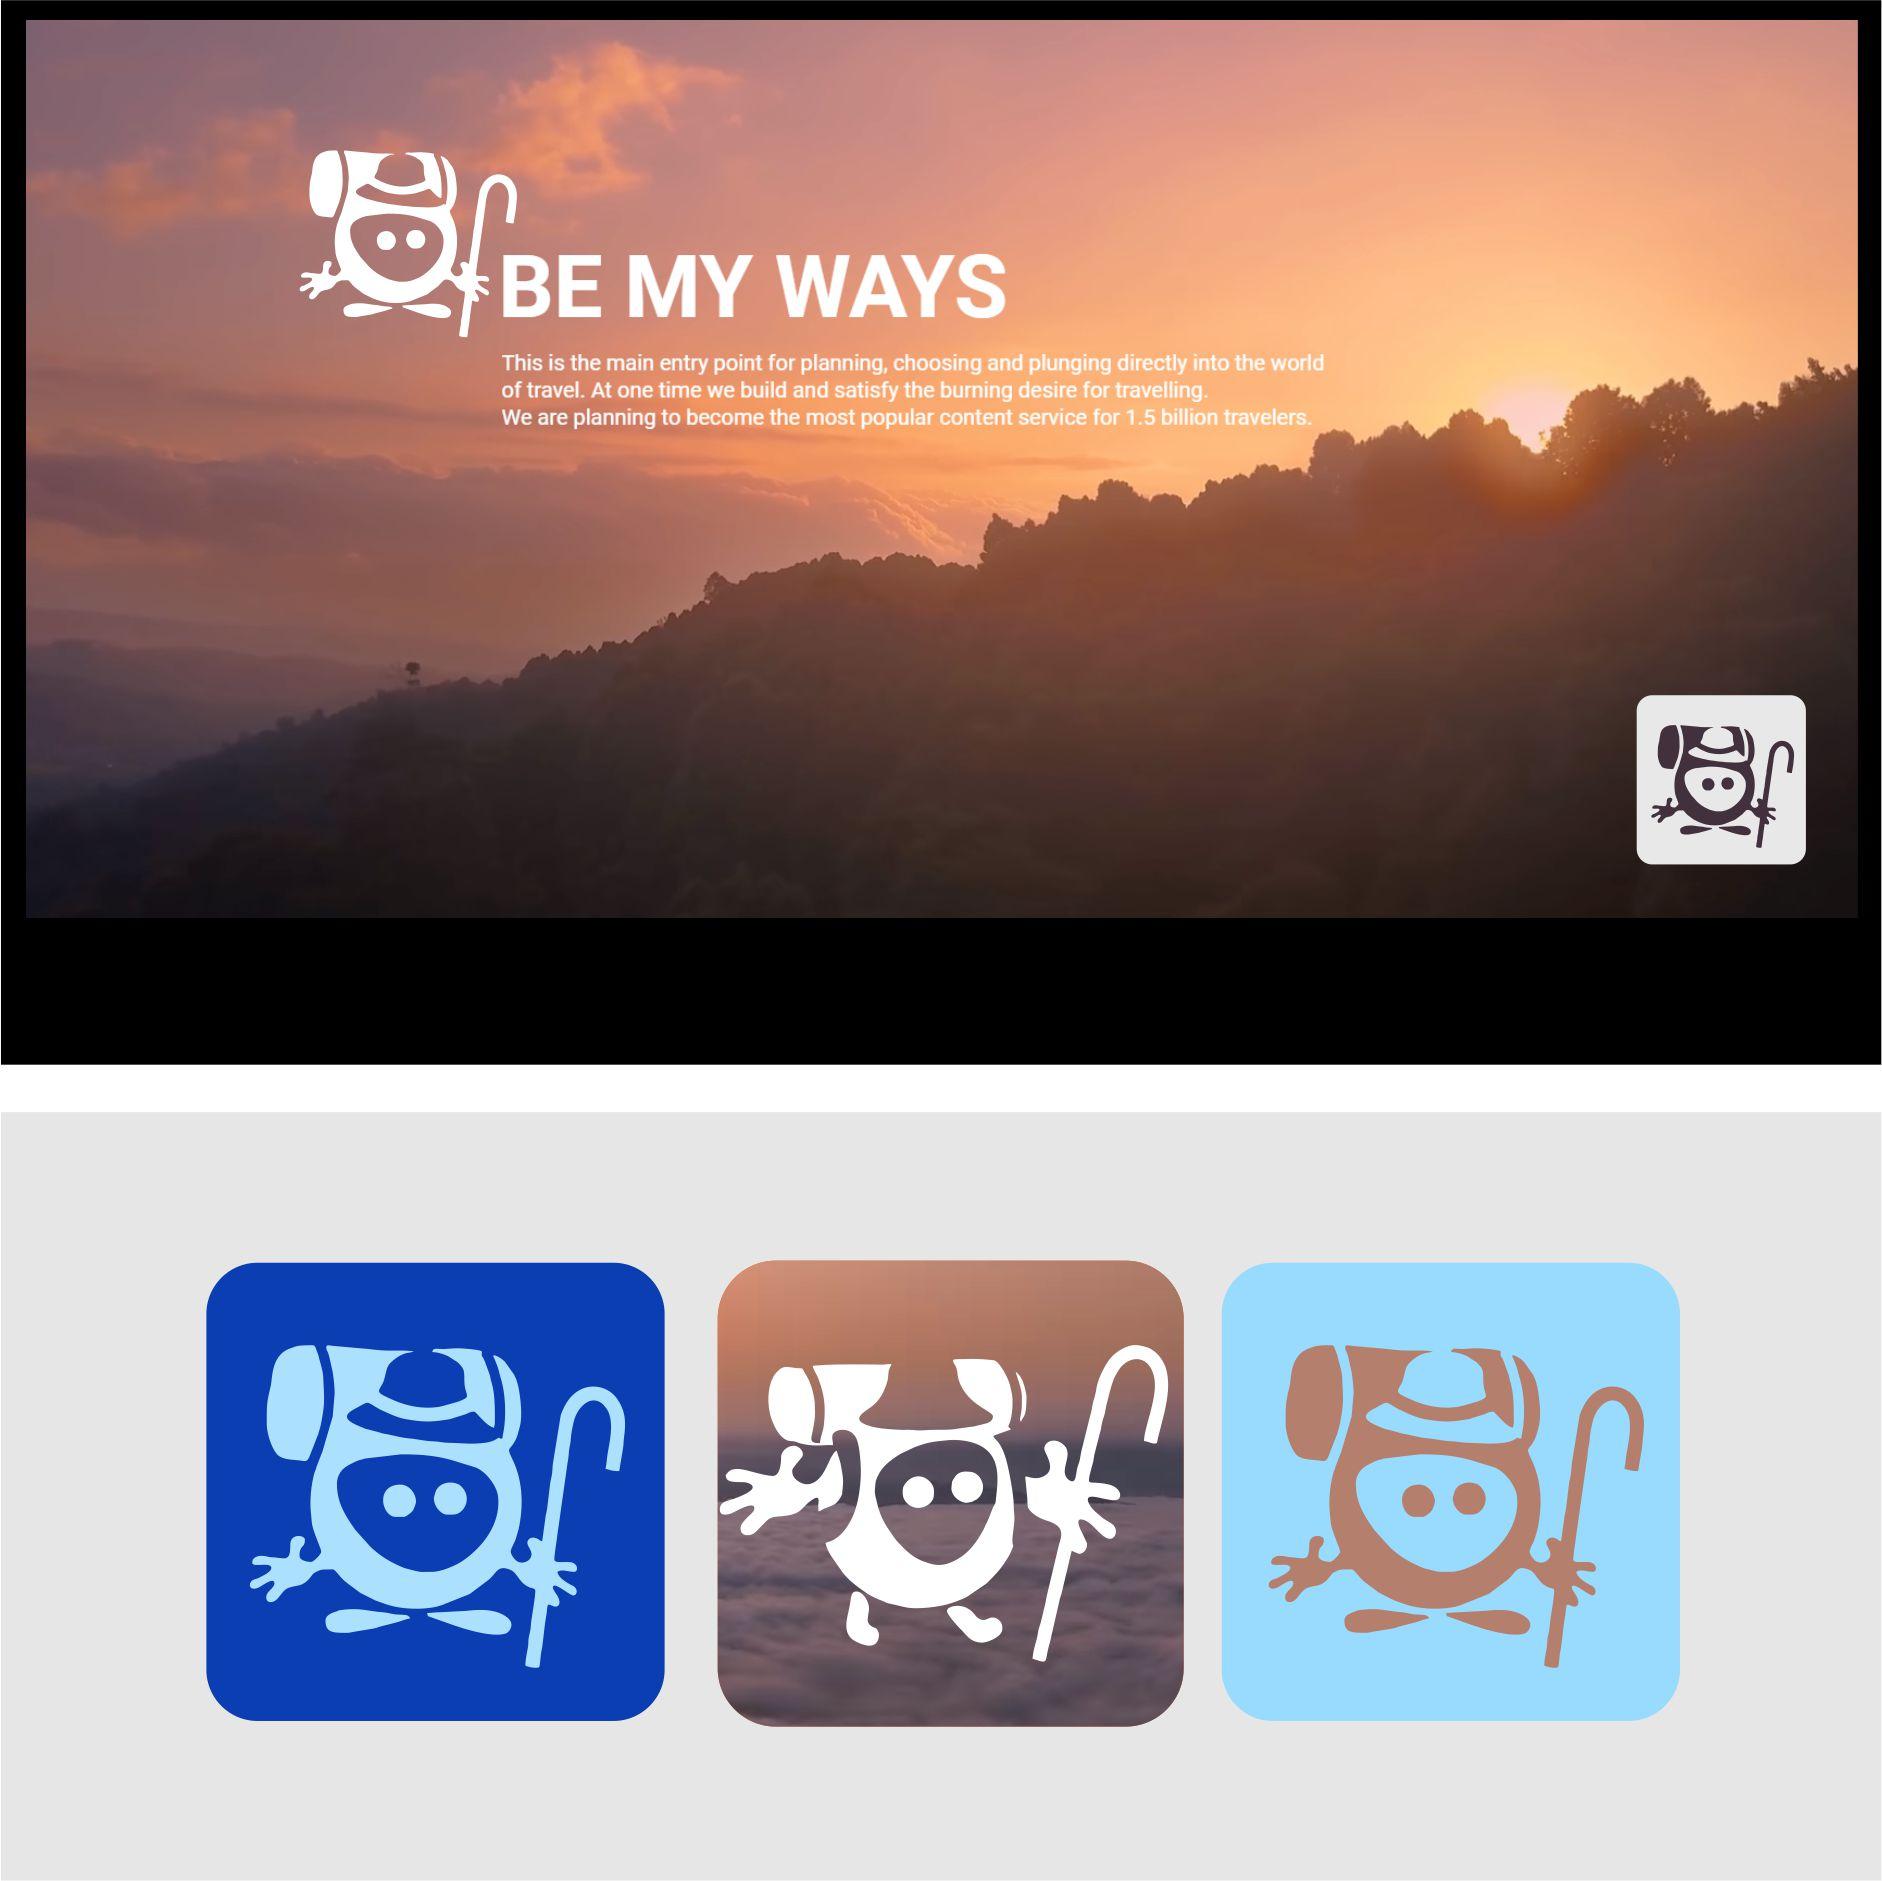 Разработка логотипа и иконки для Travel Video Platform фото f_5635c3c601cb745a.jpg